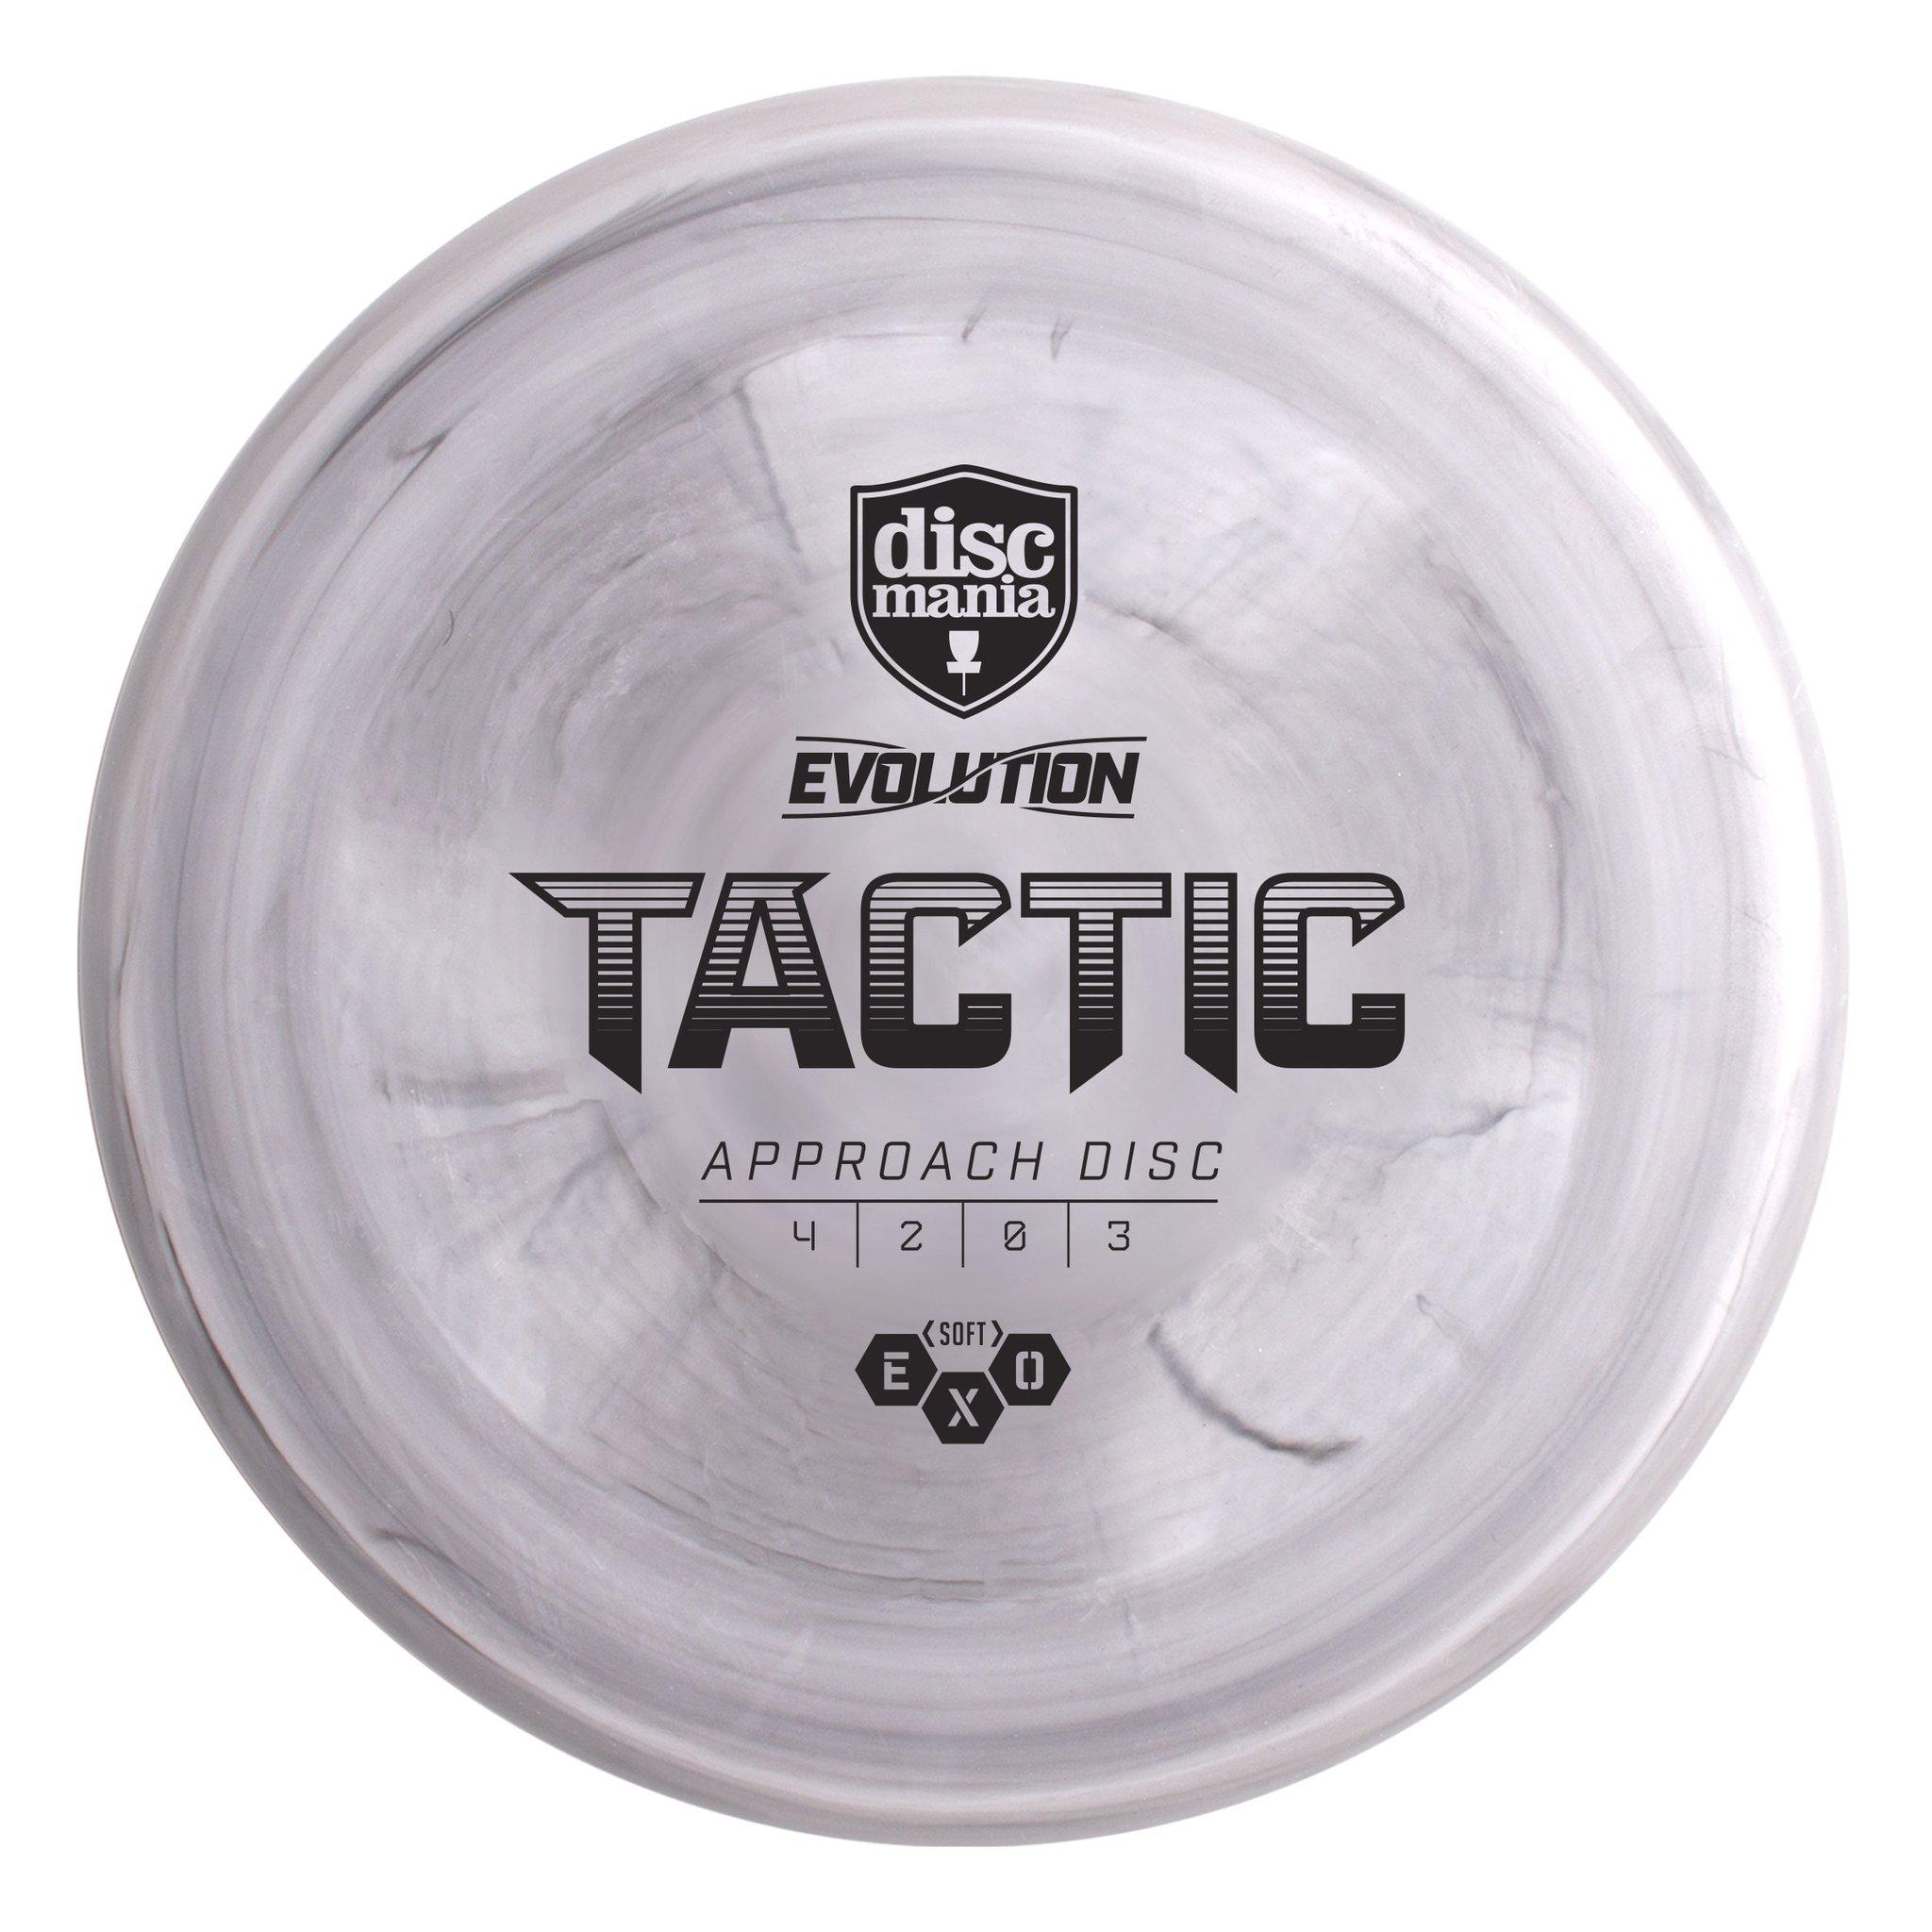 Tactic Exo Soft